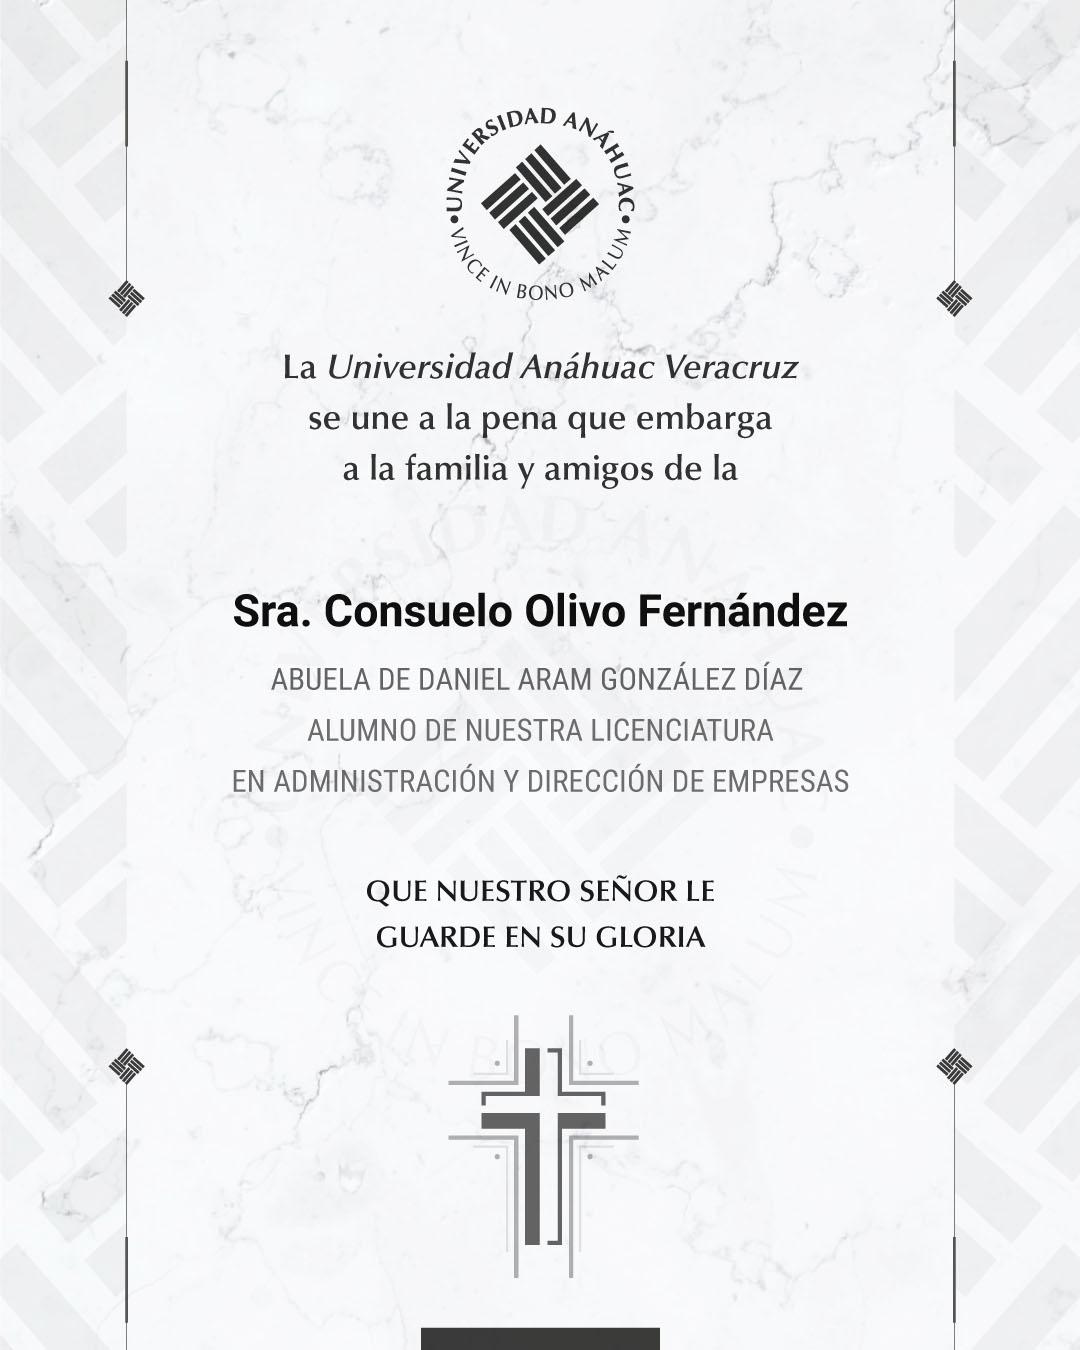 Sra. Consuelo Olivo Fernández